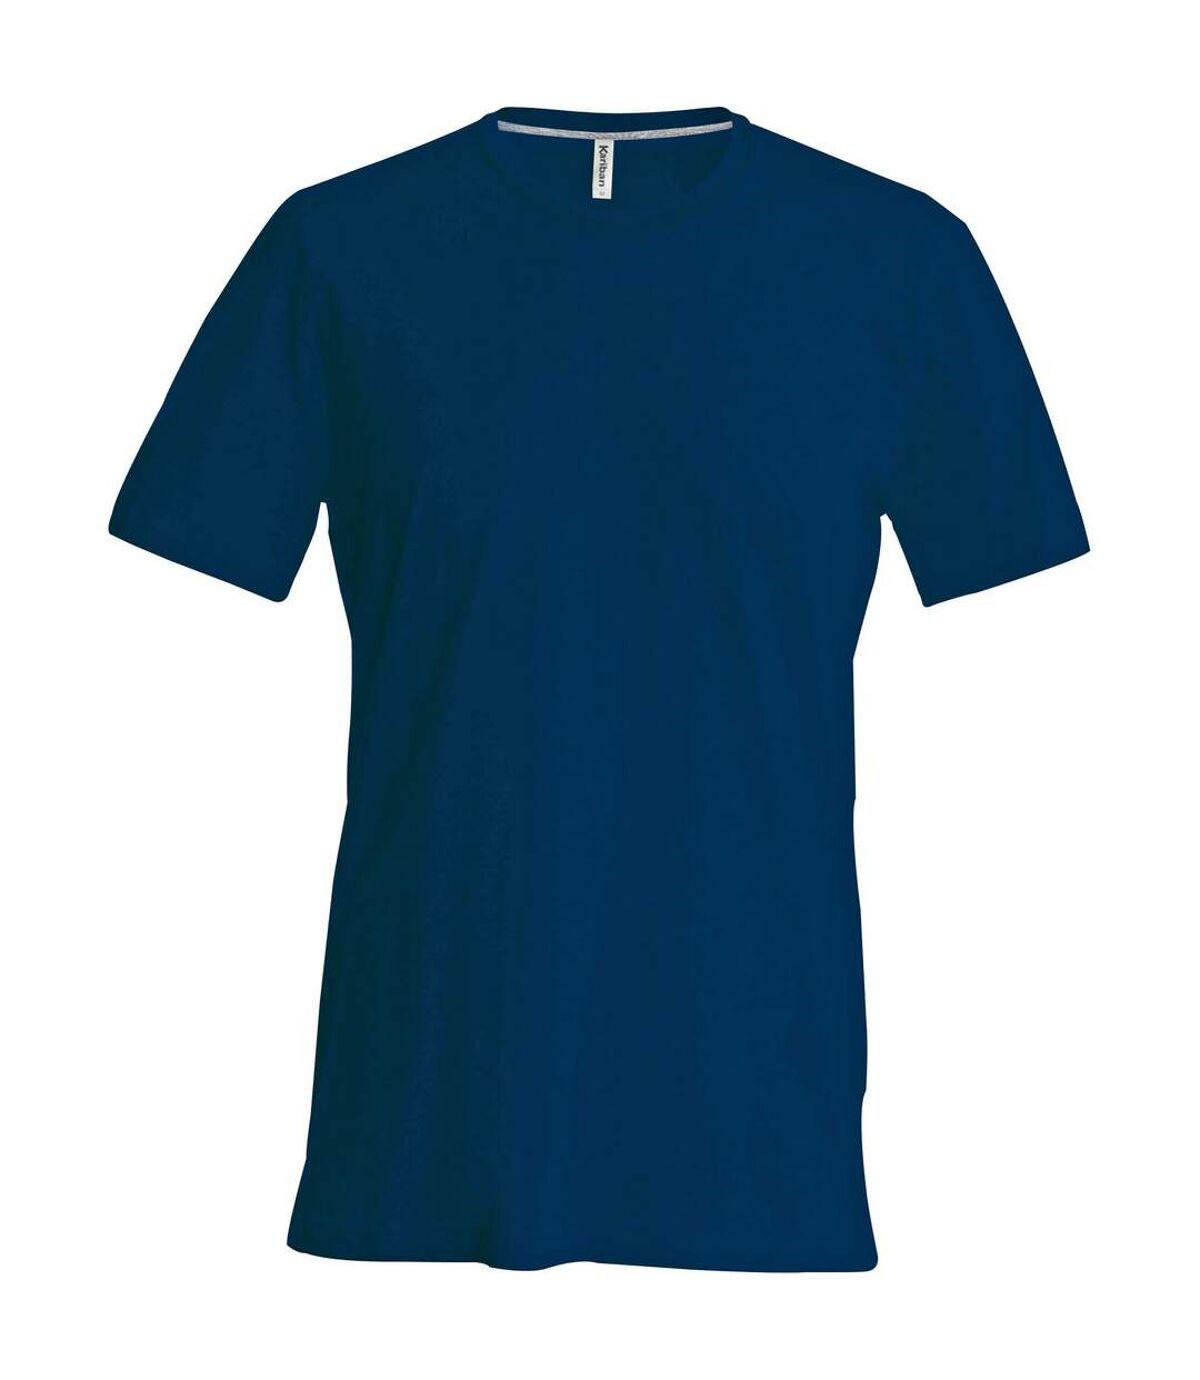 Kariban Mens Slim Fit Short Sleeve Crew Neck T-Shirt (Navy) - UTRW706